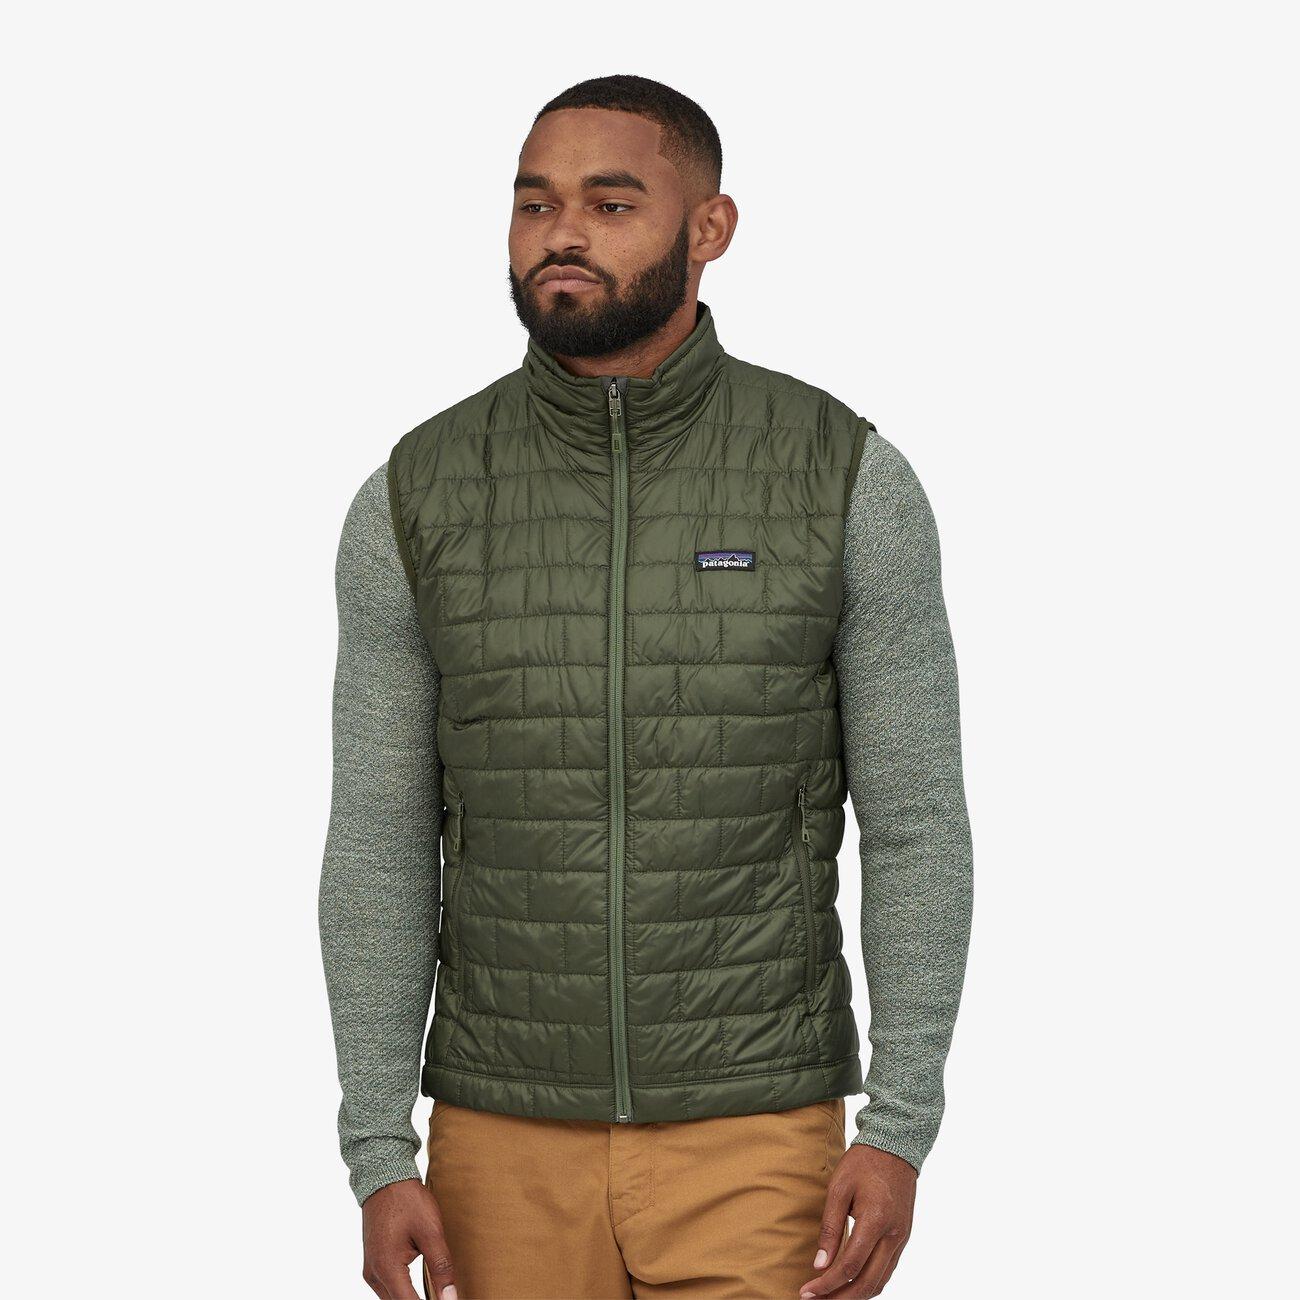 patagonia green nano puff men's vest